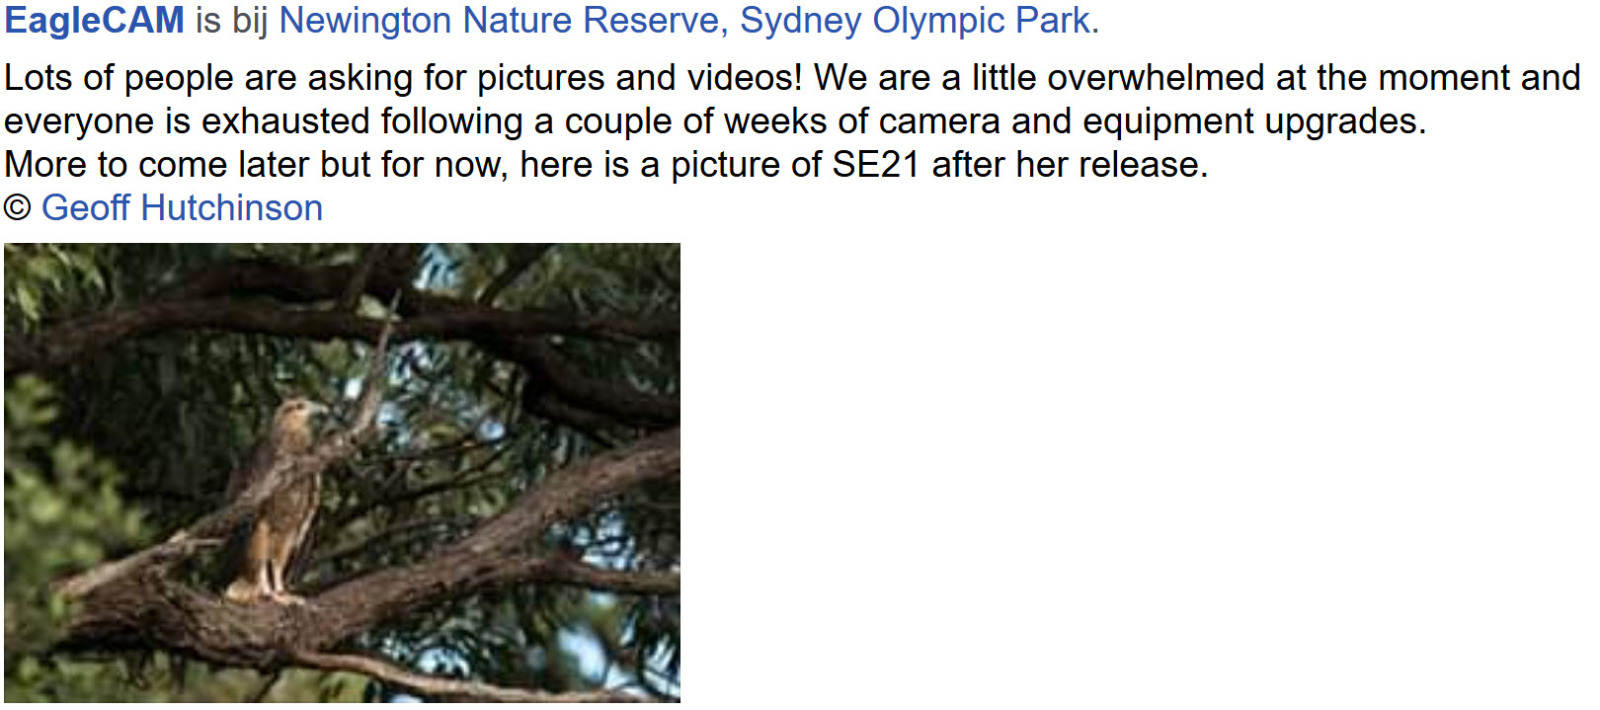 Sidney Sea-Eagle cam. - Pagina 10 6ygxsz